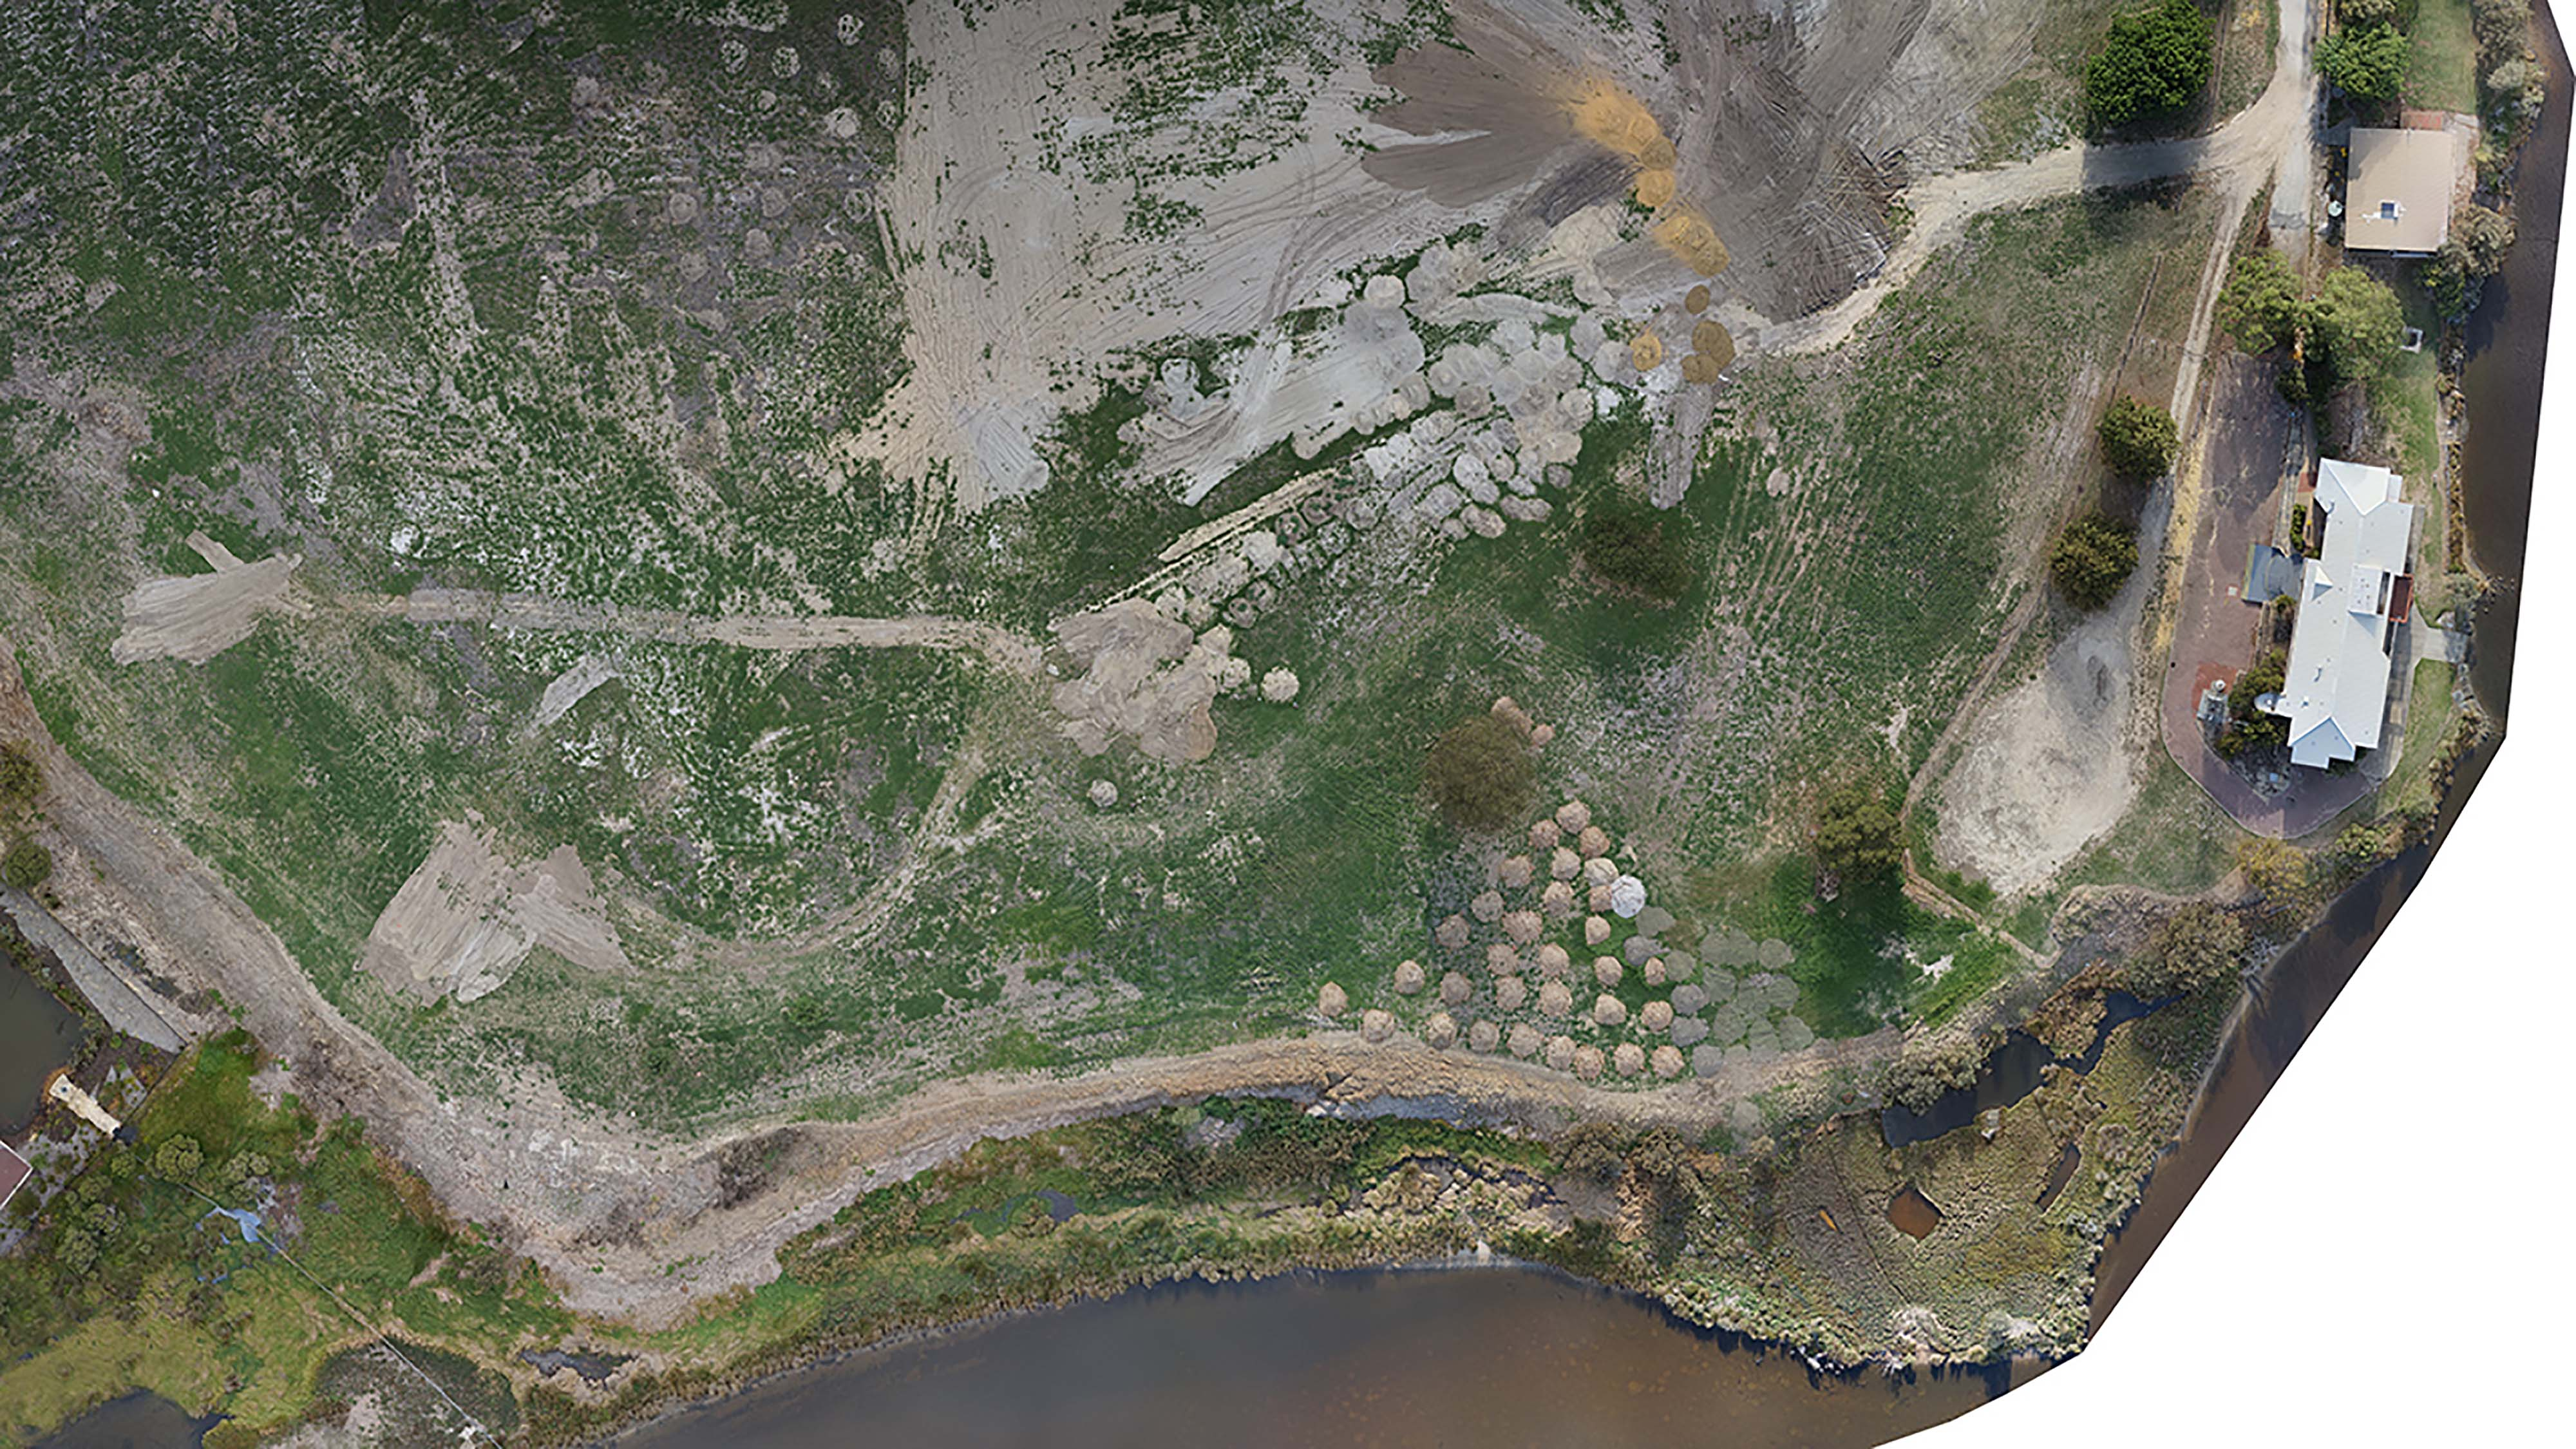 Perth Drone Centre - Environmental Monitoring